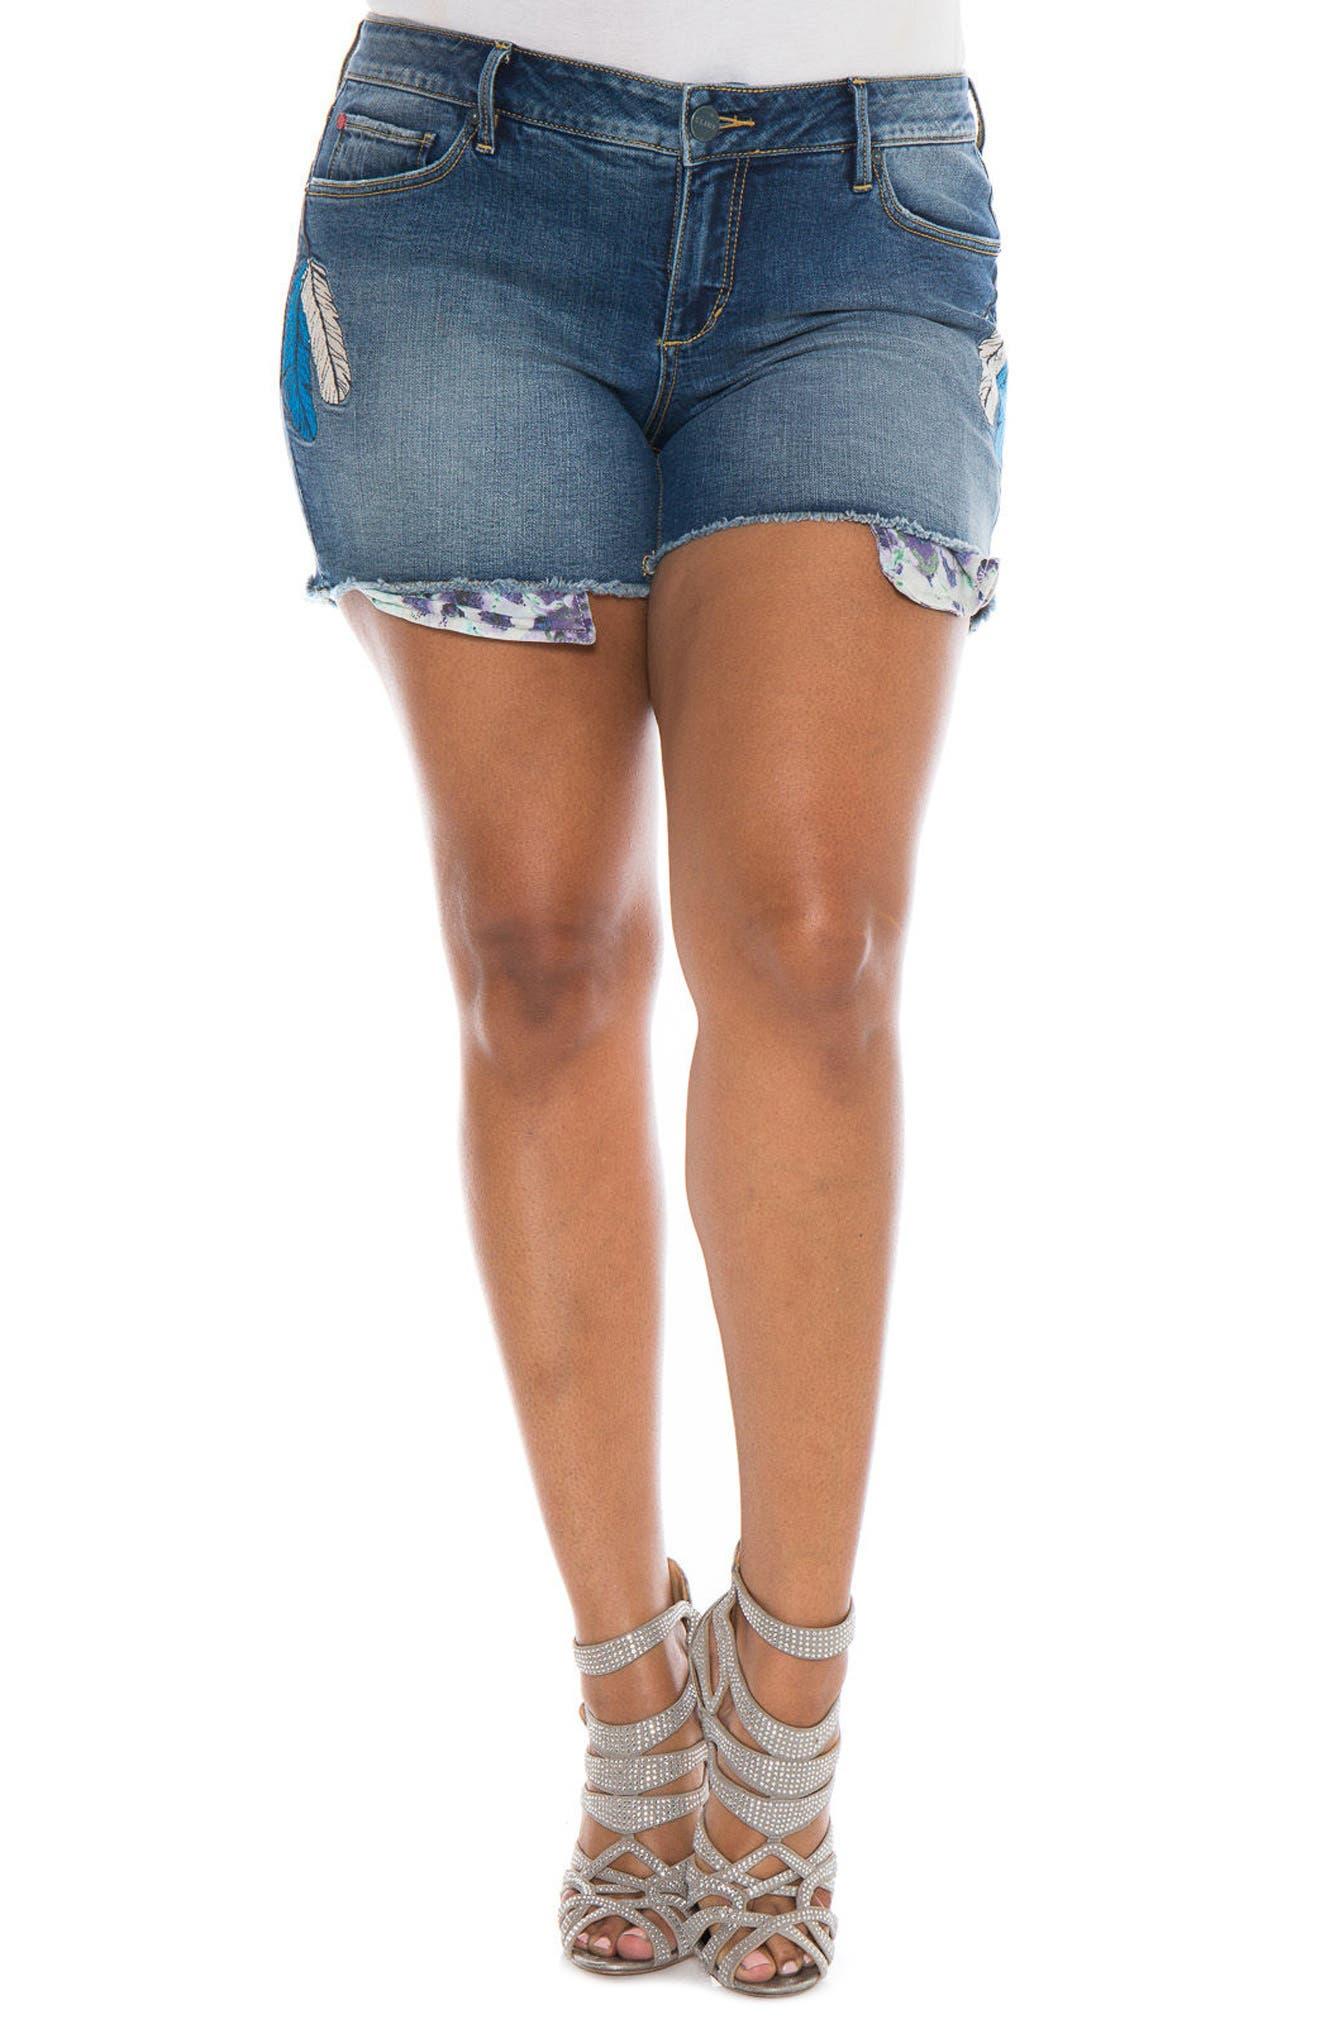 SLINK Jeans Embroidered Cutoff Denim Shorts (Plus Size)